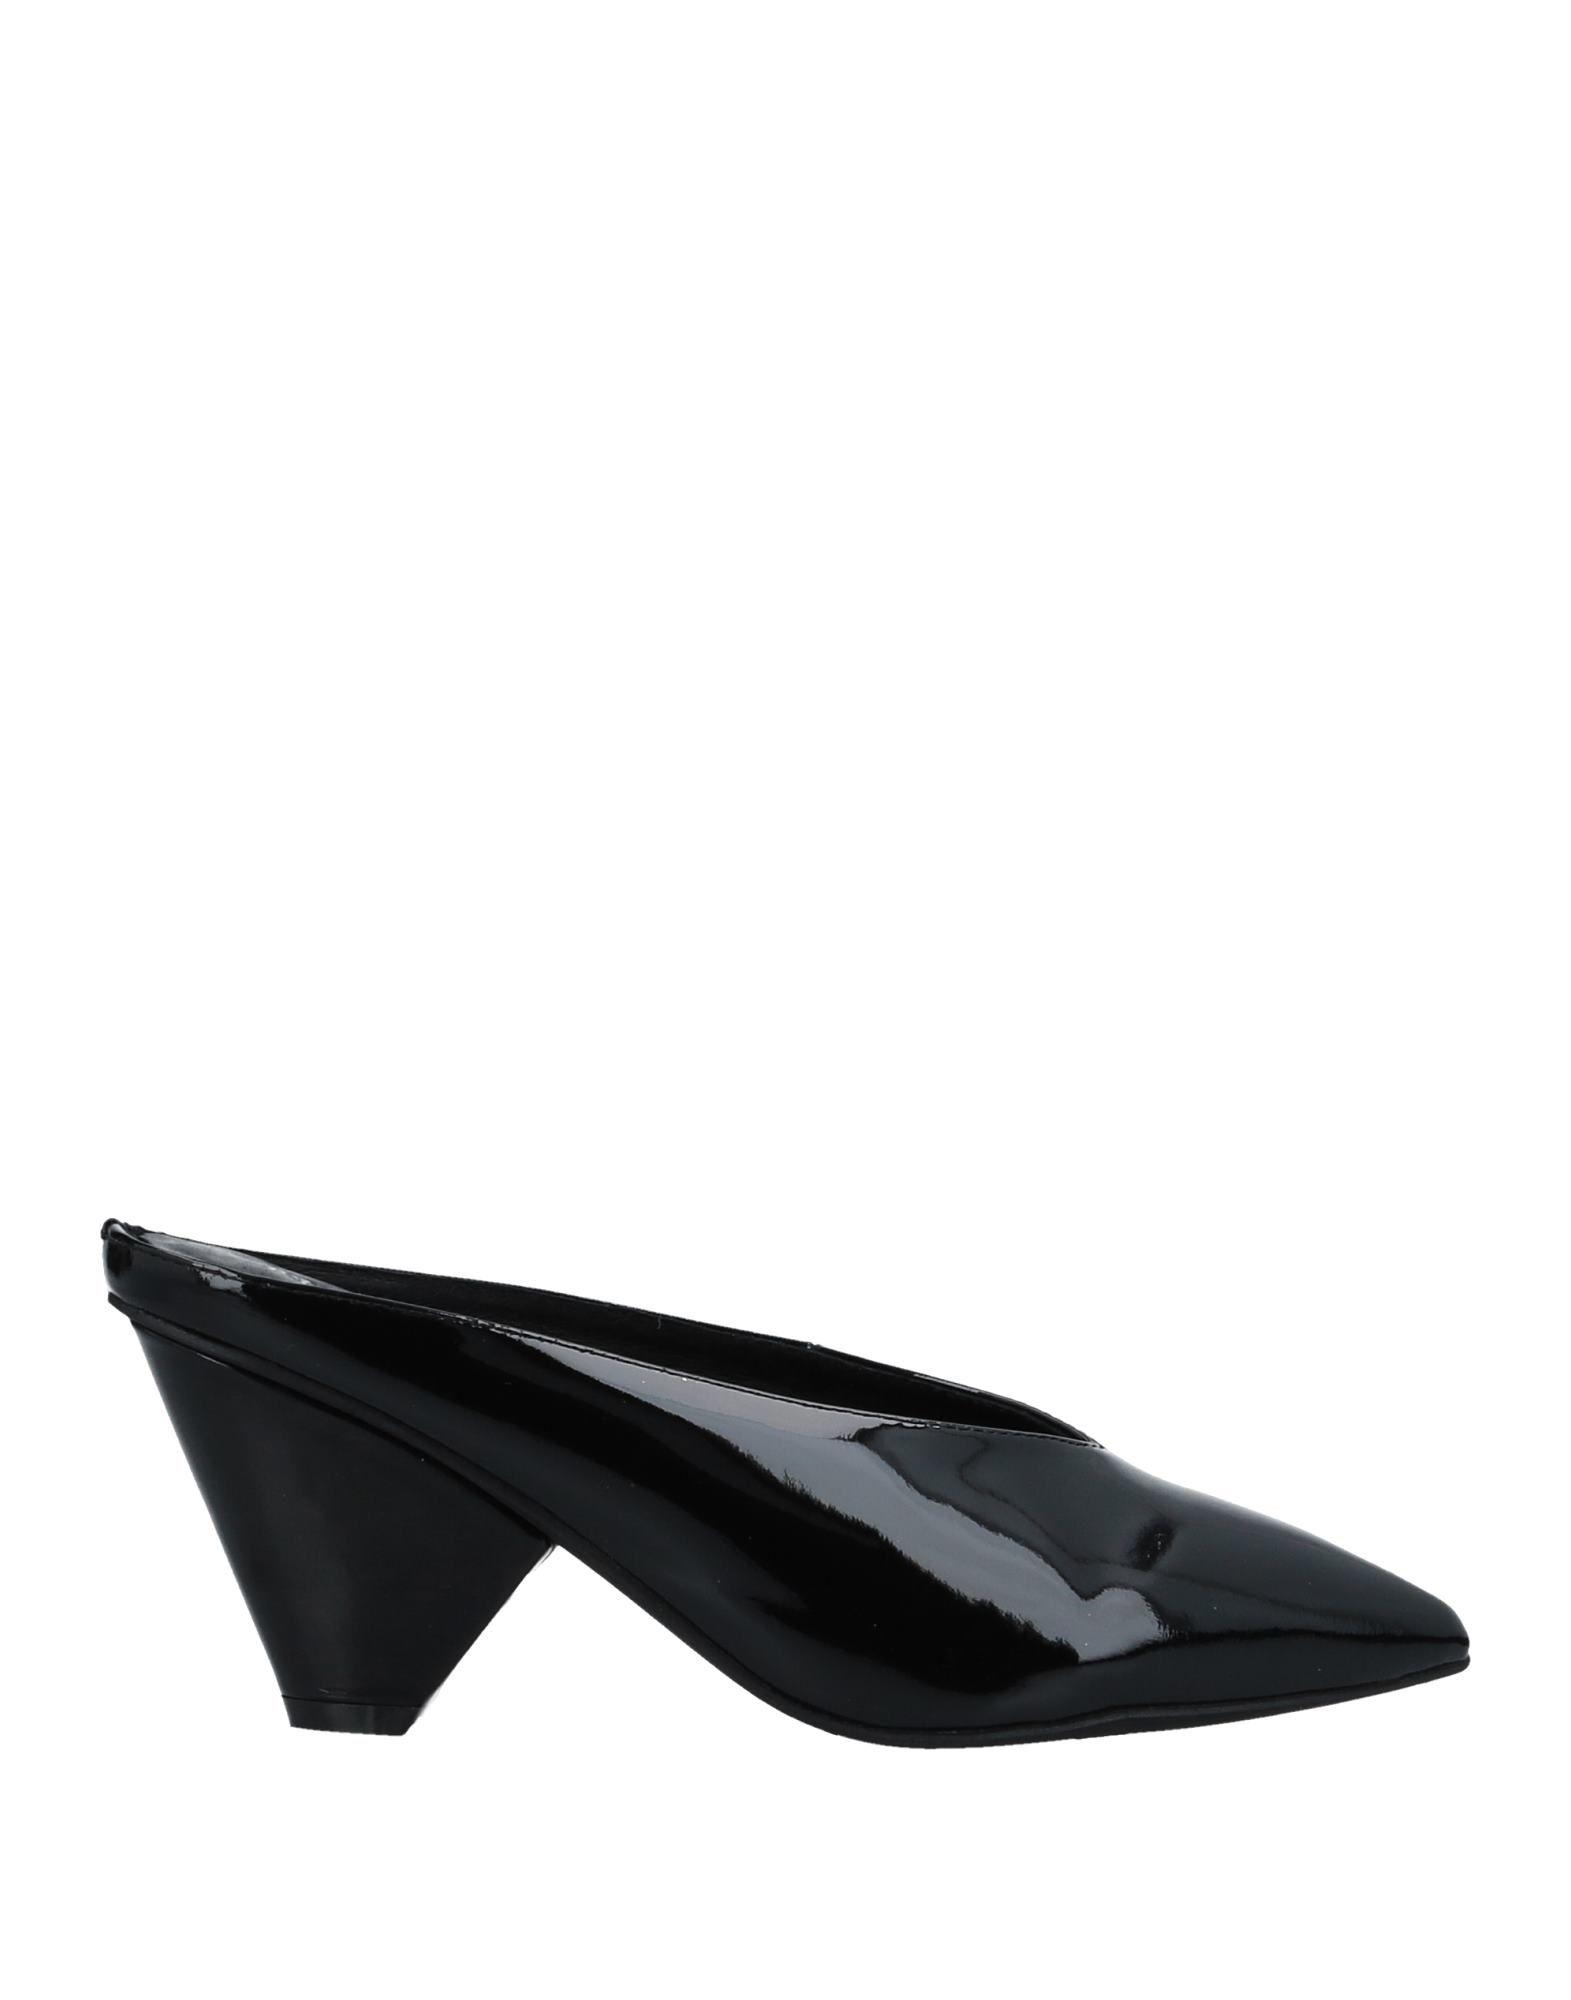 Stivaletti Cafènoir Donna e - 11479614EQ Nuove offerte e Donna scarpe comode 573a05